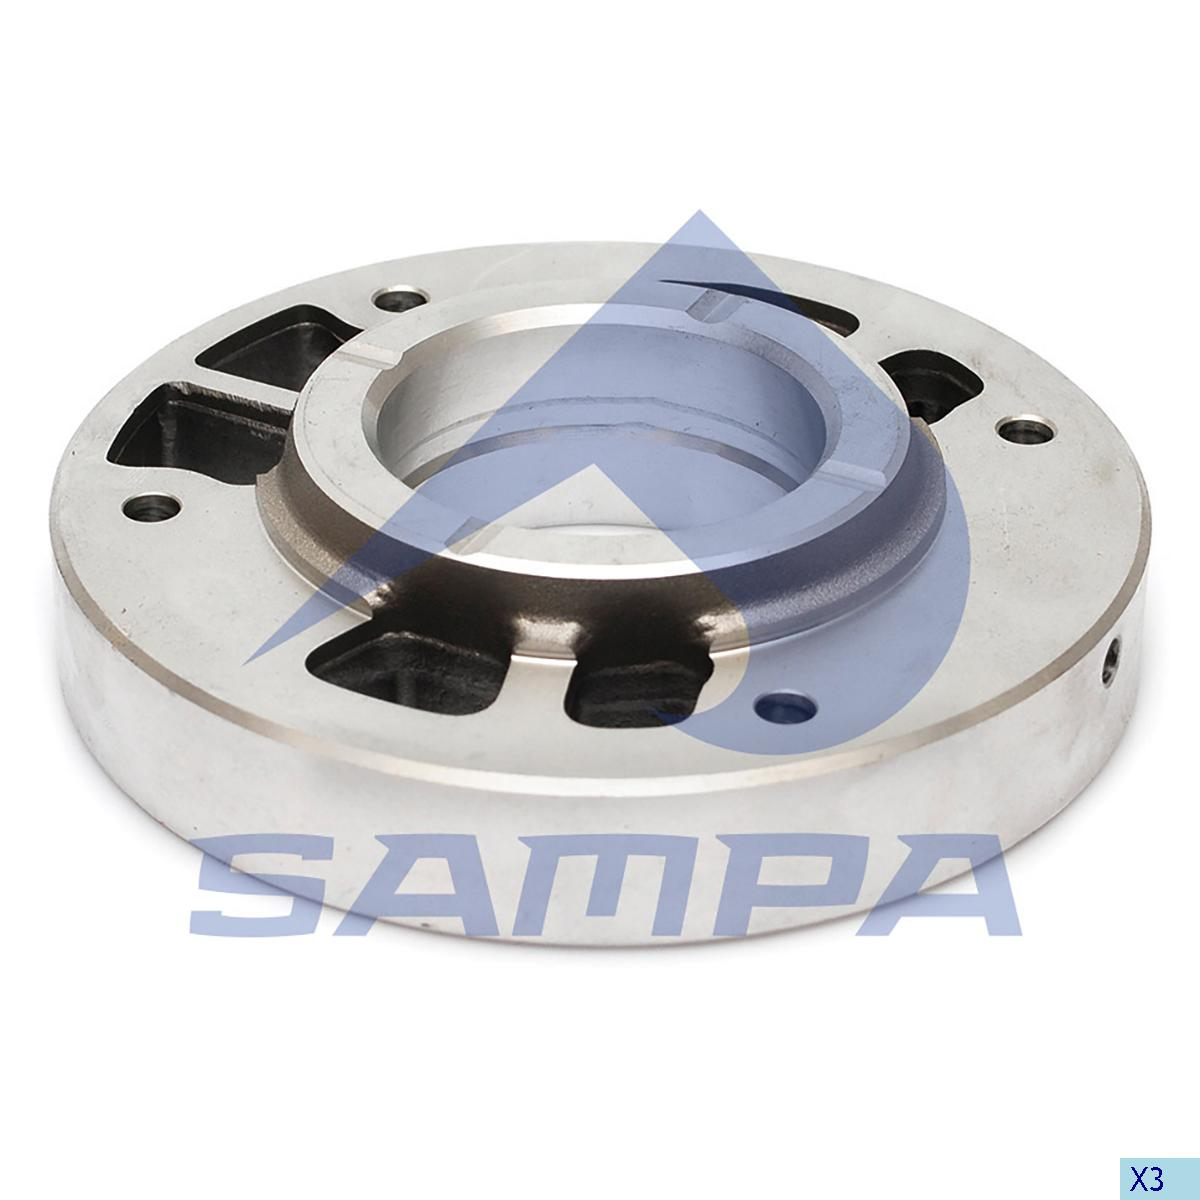 Cover, Cylinder Block, Daf, Compressed Air System